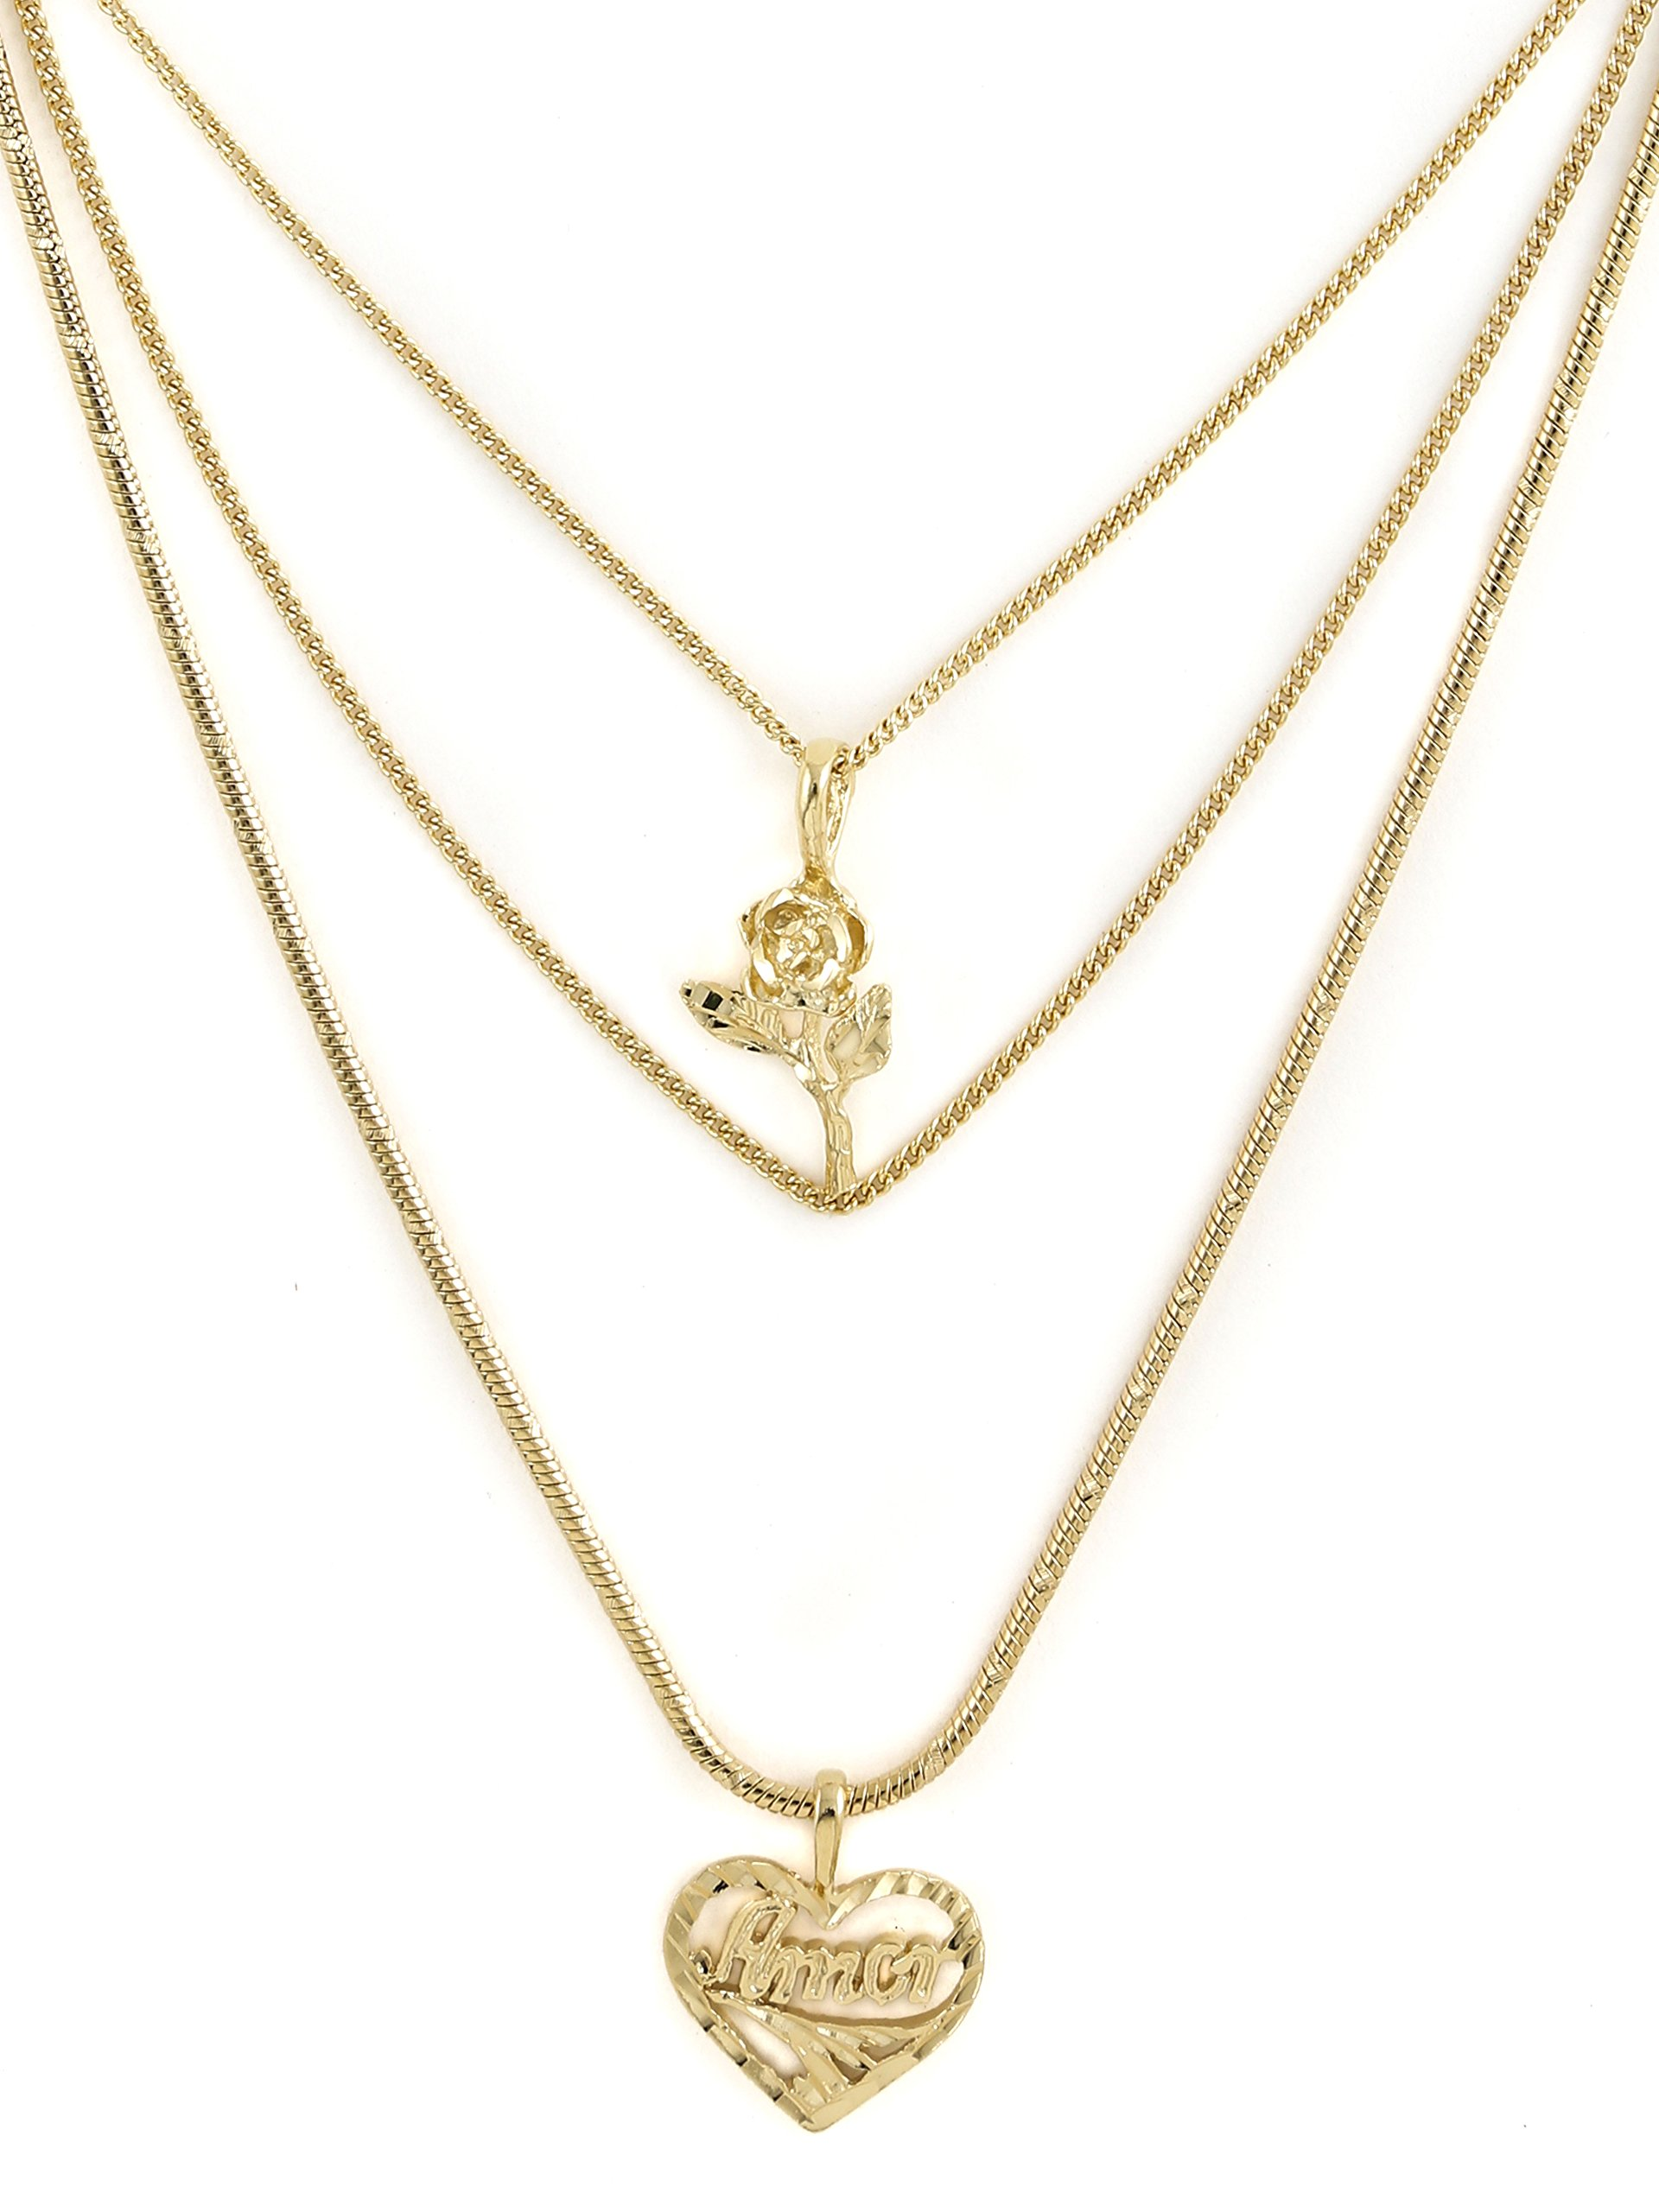 Vanessa Mooney Women's Cielo Rose & Amor Necklace by Vanessa Mooney